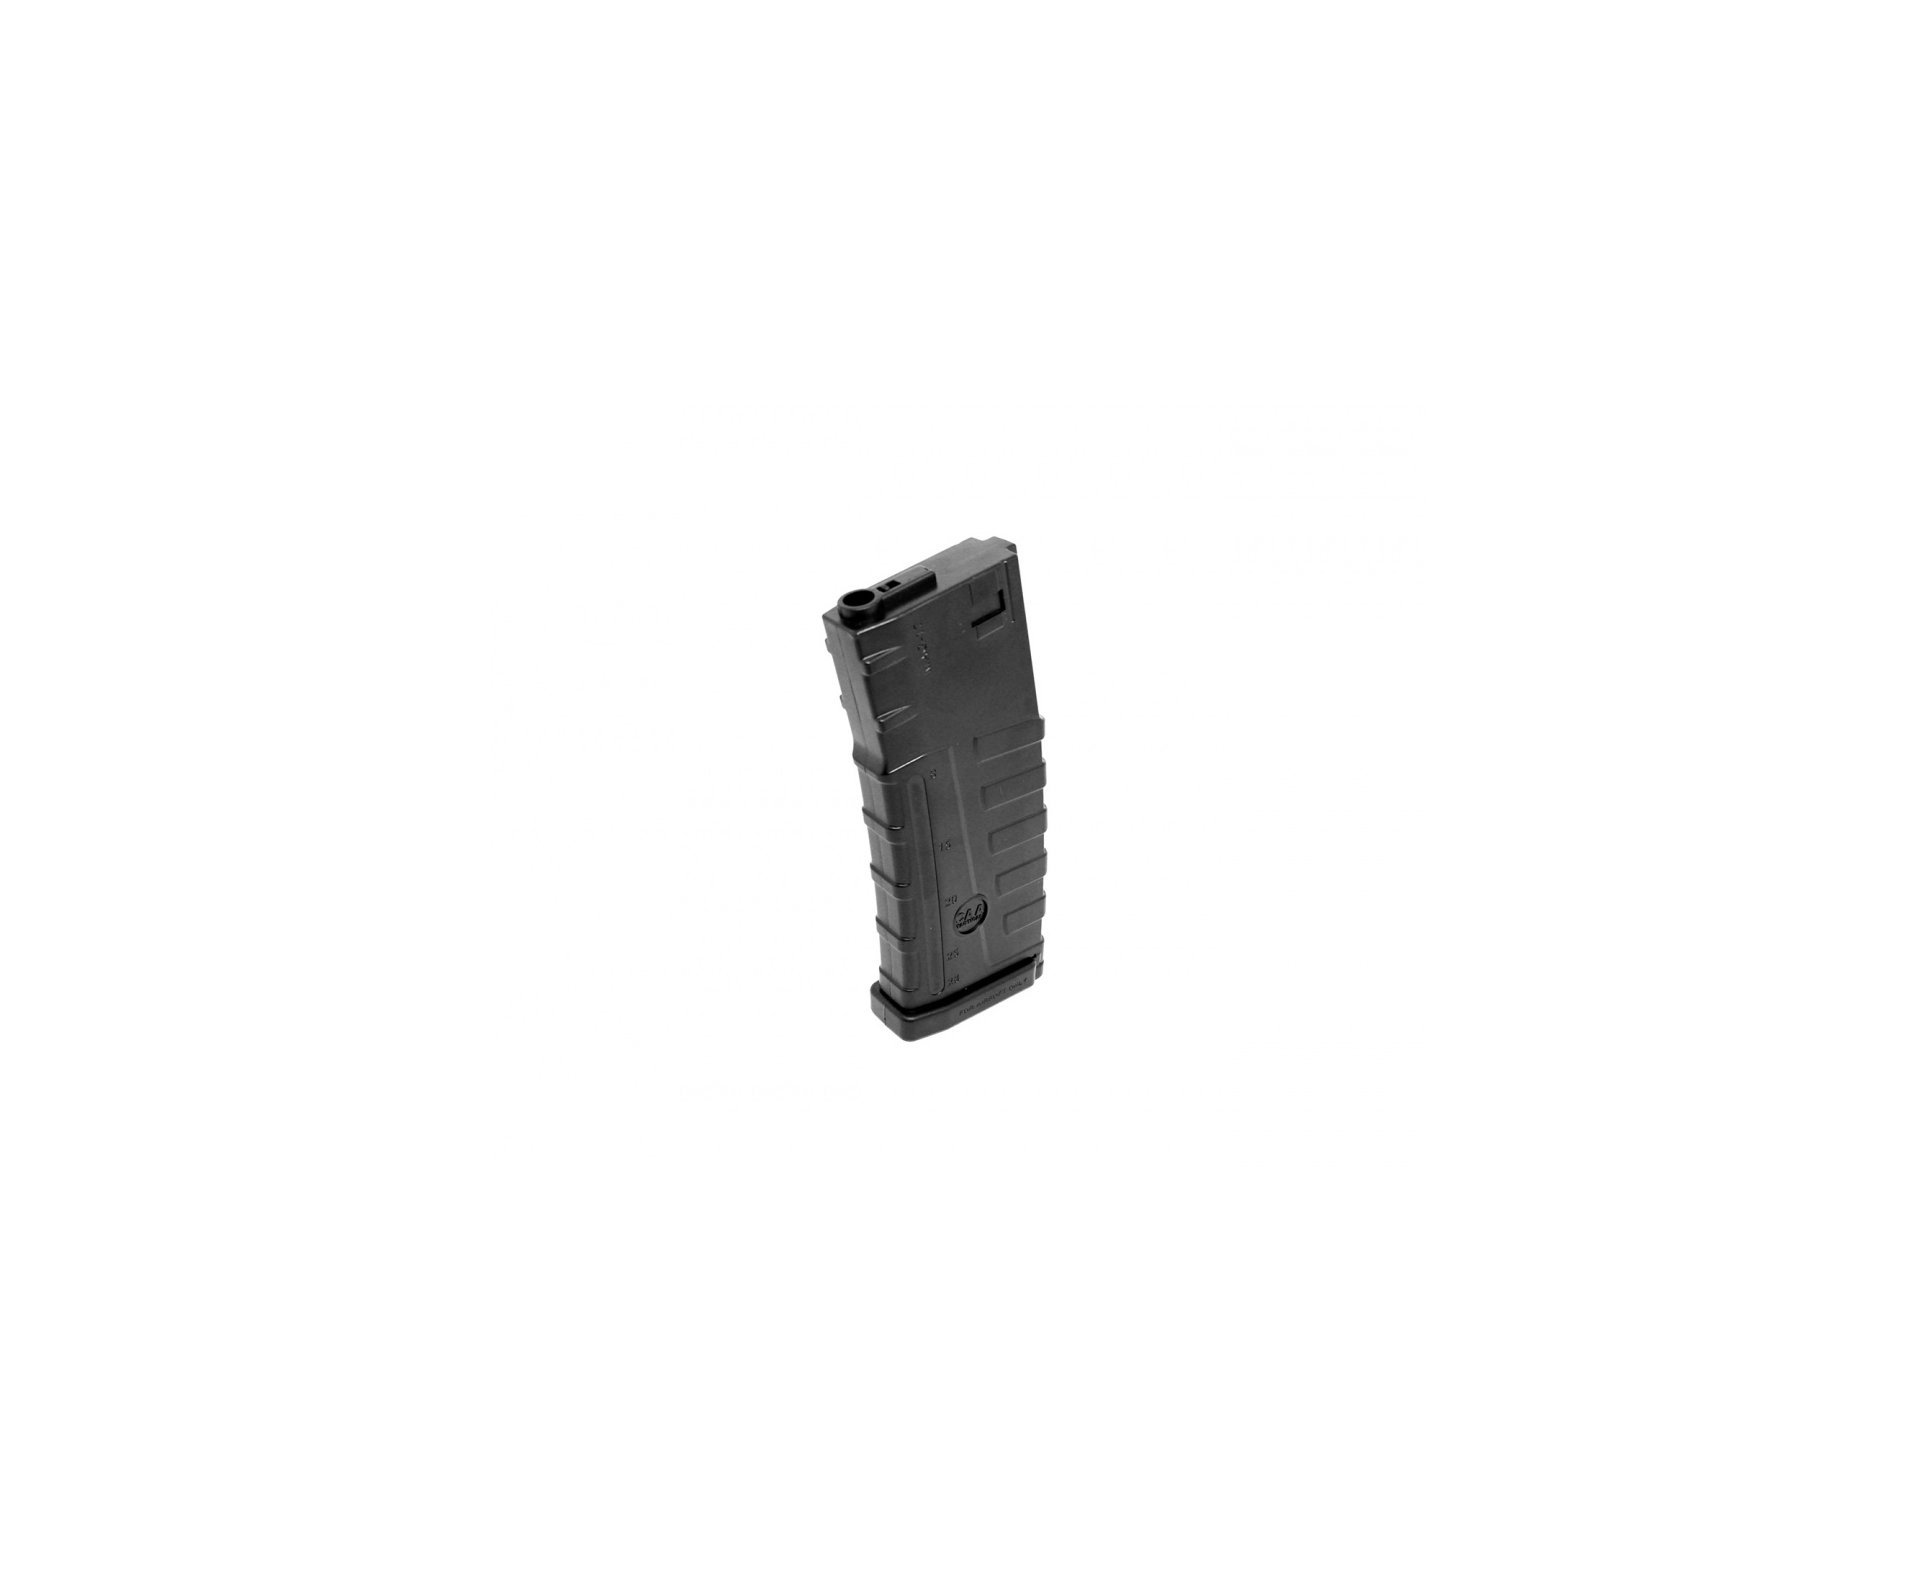 Rifle De Airsoft M4 Carbine Caa Custom Cal 6mm  + Capa + Mag Extra + Esfera 0,20g